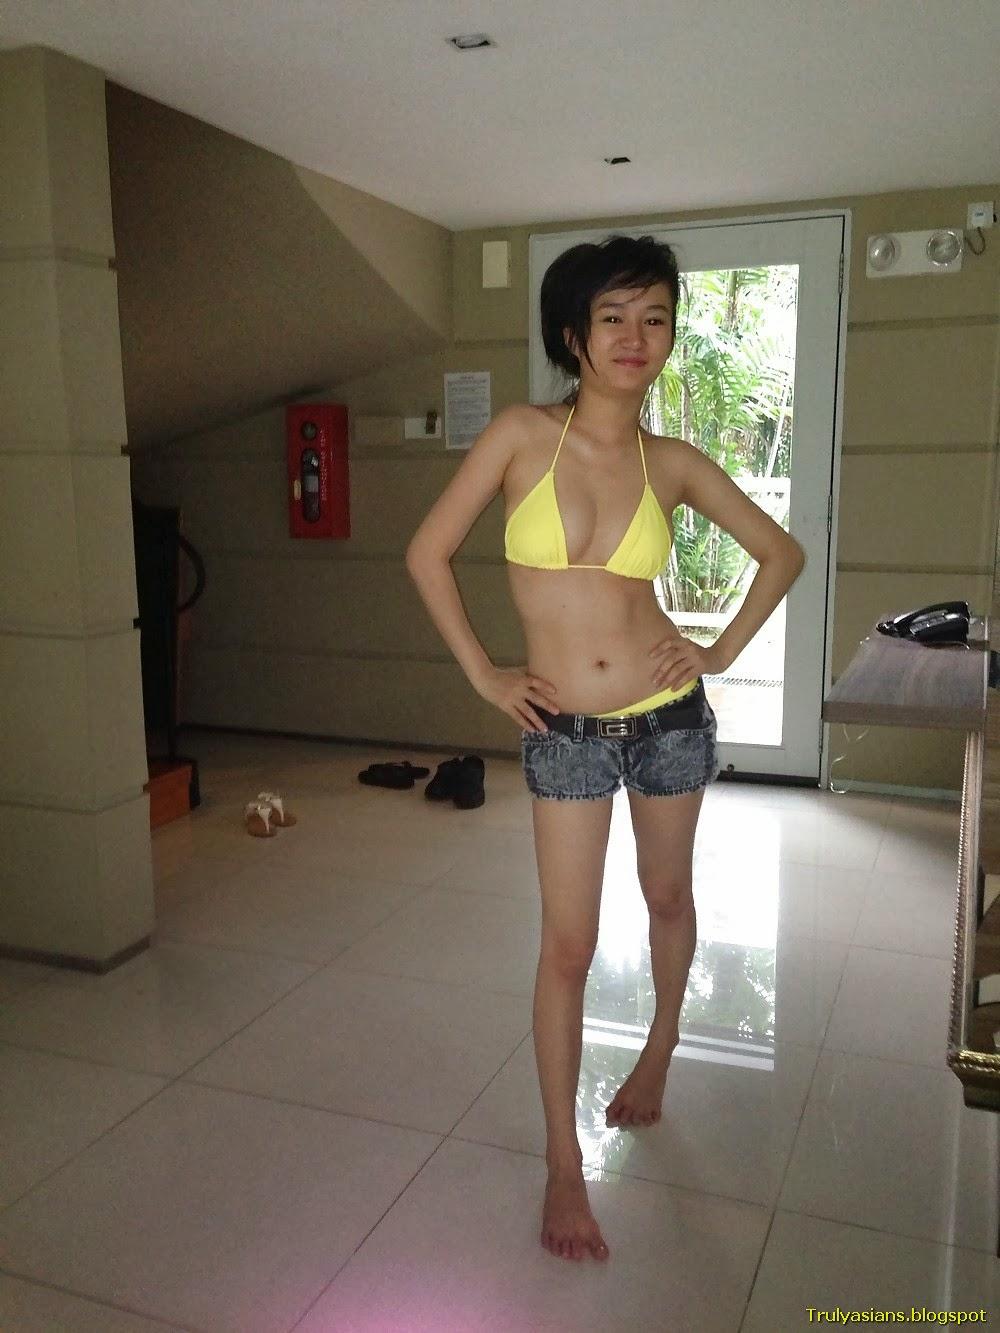 http://1.bp.blogspot.com/-E-PLSImja7U/UpZ_3j84DdI/AAAAAAAANyI/KcbJLgqP2ZE/s1600/trulyasians.blogspot+-+Taiwan+GF+Wild+Sex+in+Singapore+028+.jpg